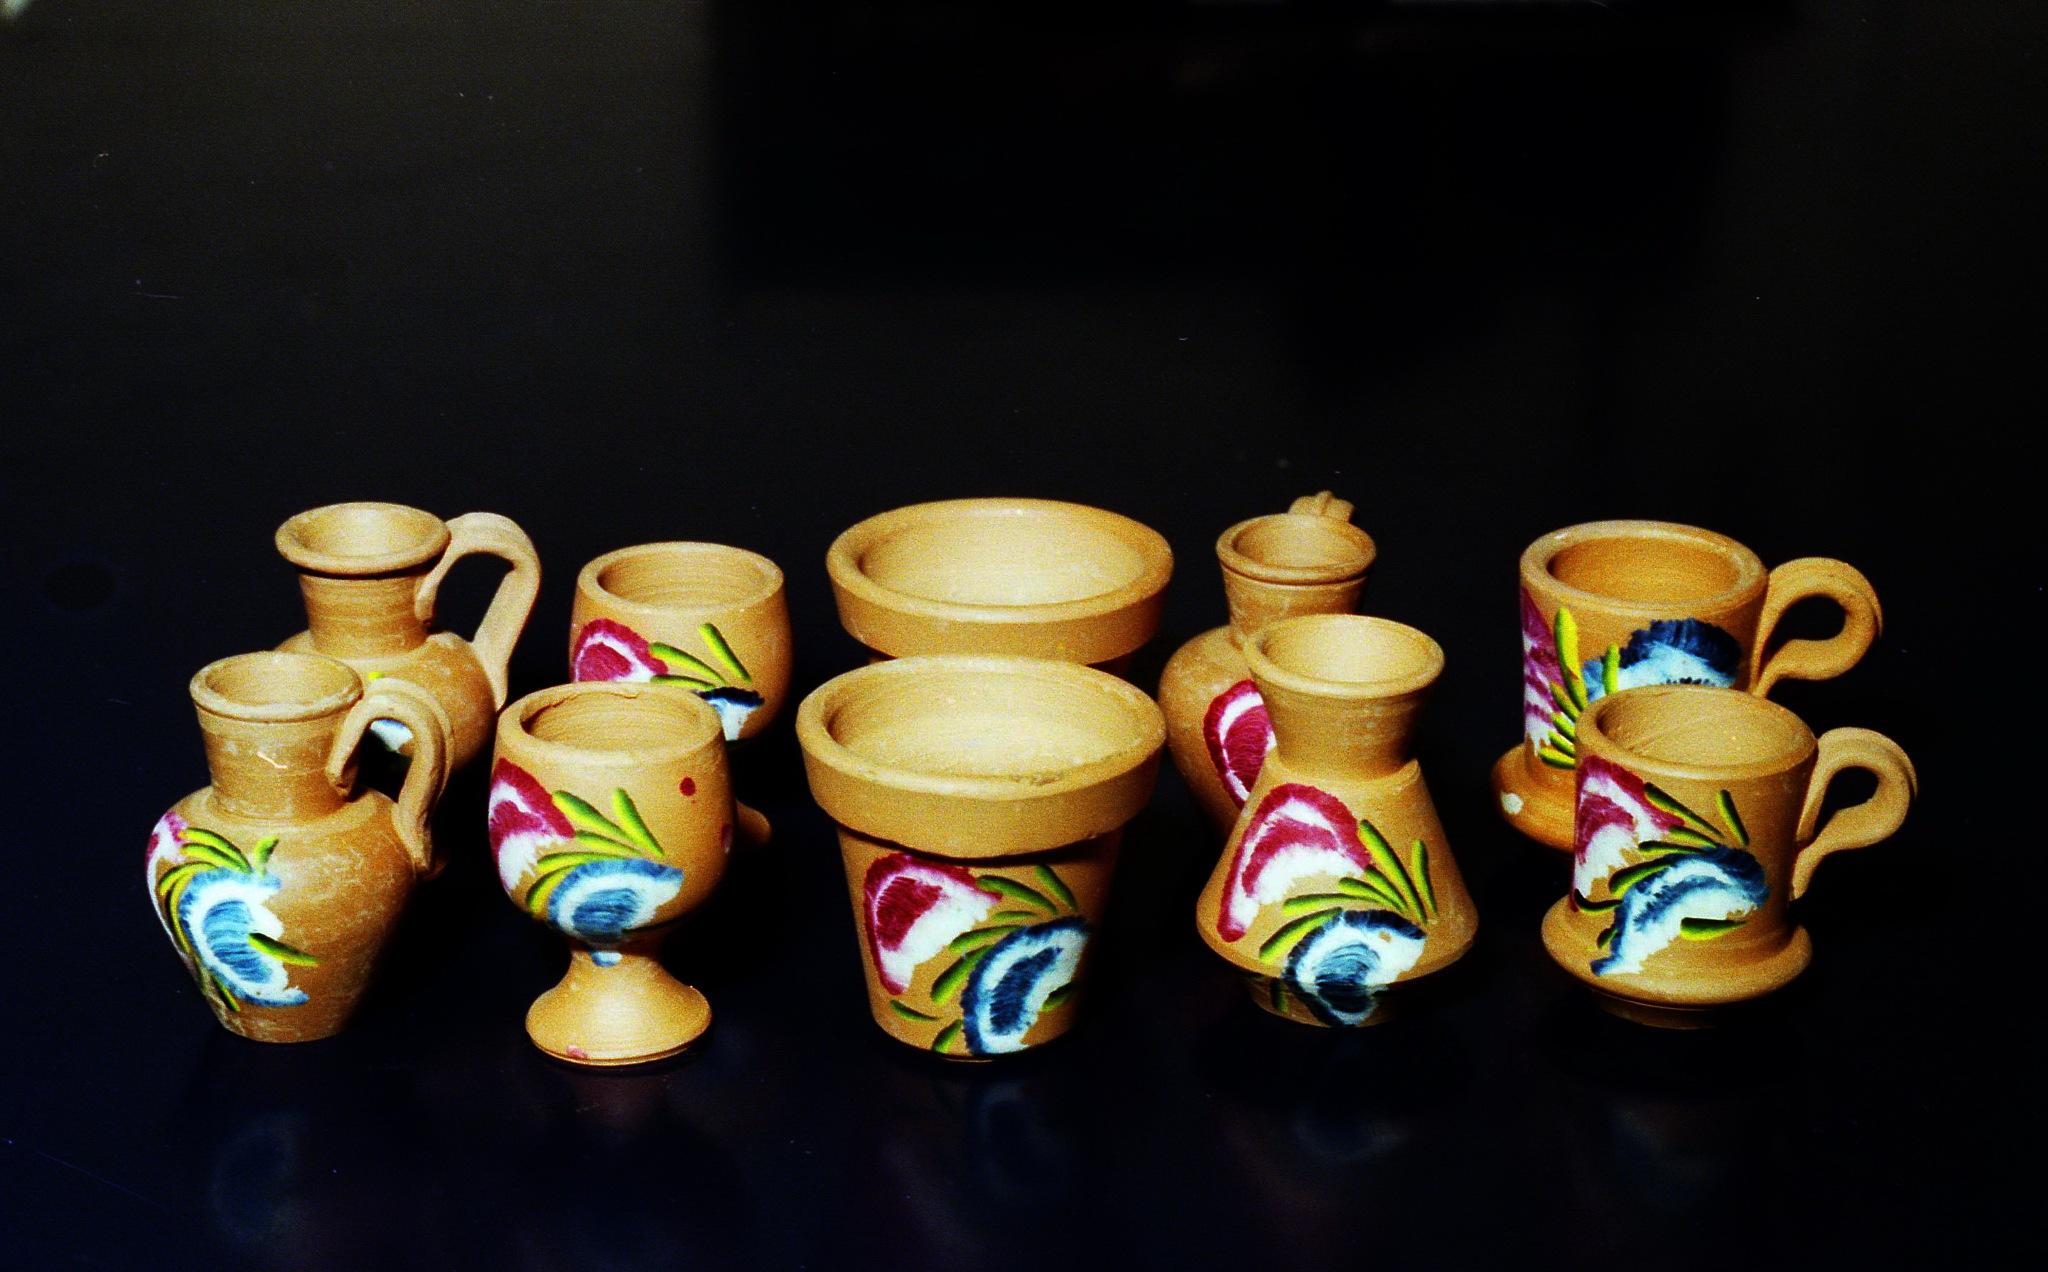 1978 Ceramica by Jose Gonzalvo Vivas